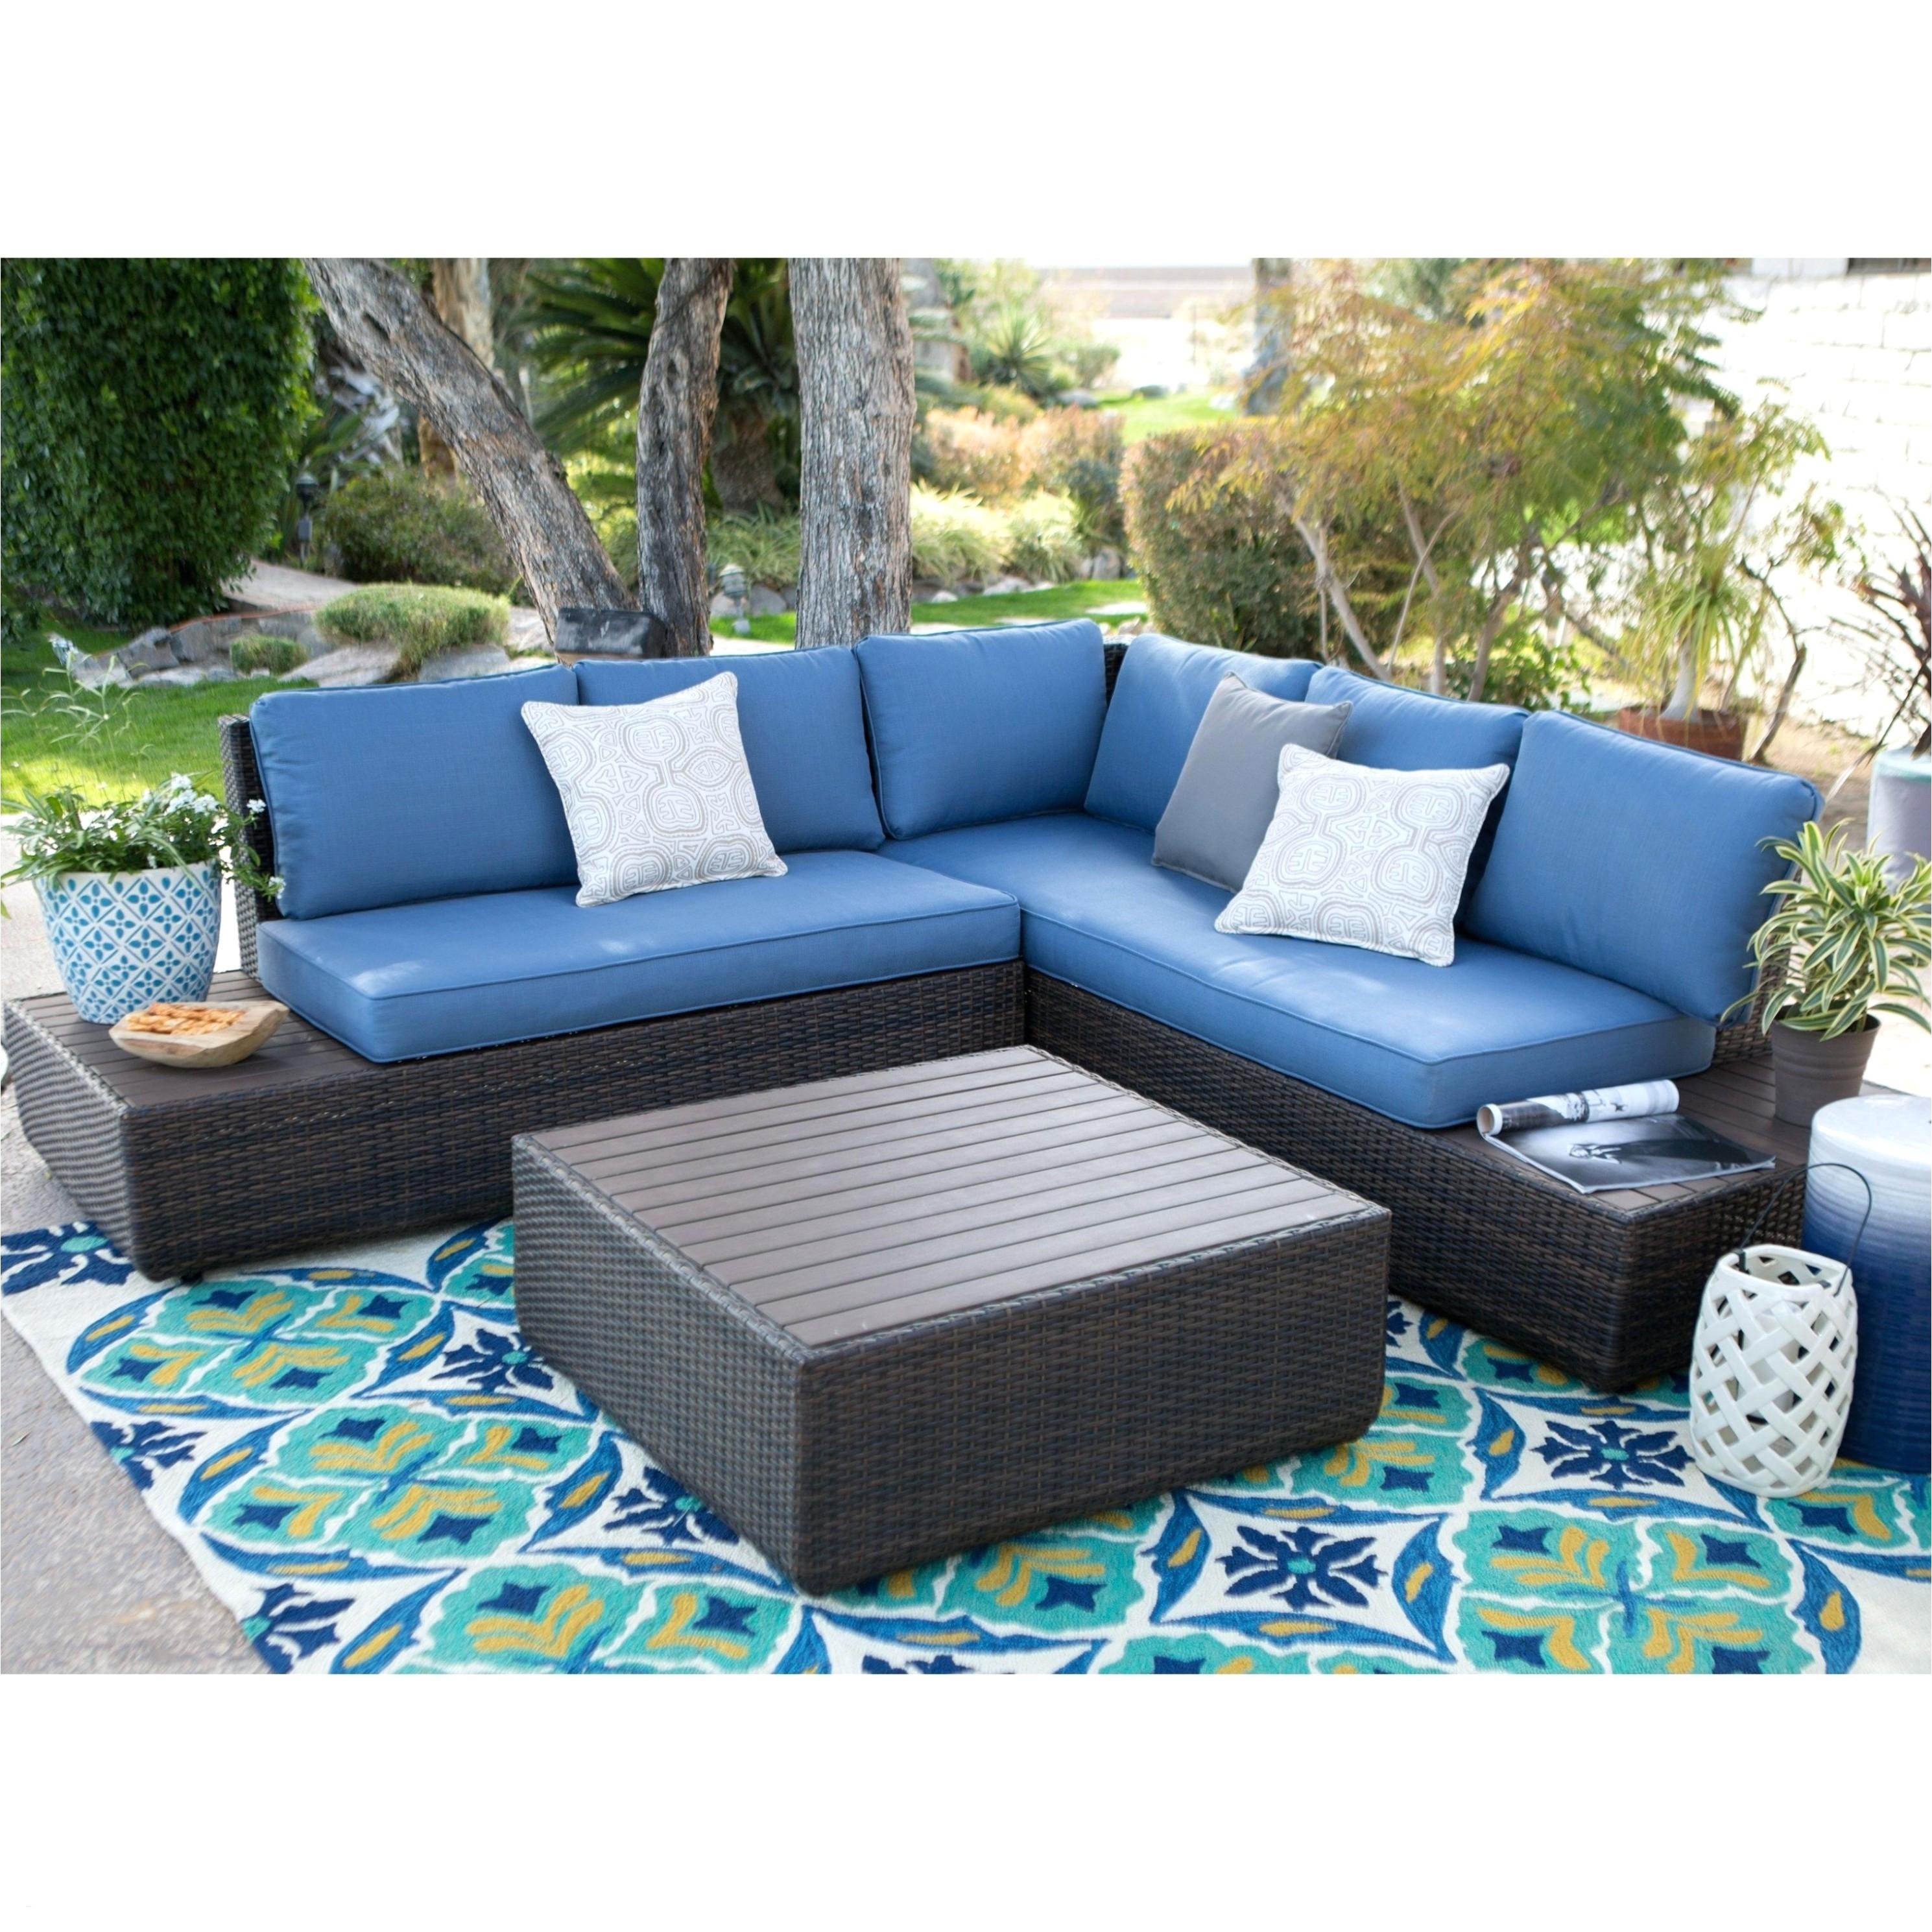 Furniture Stores Vancouver Wa Outdoor Furniture Ikea Foothillfolk Designs